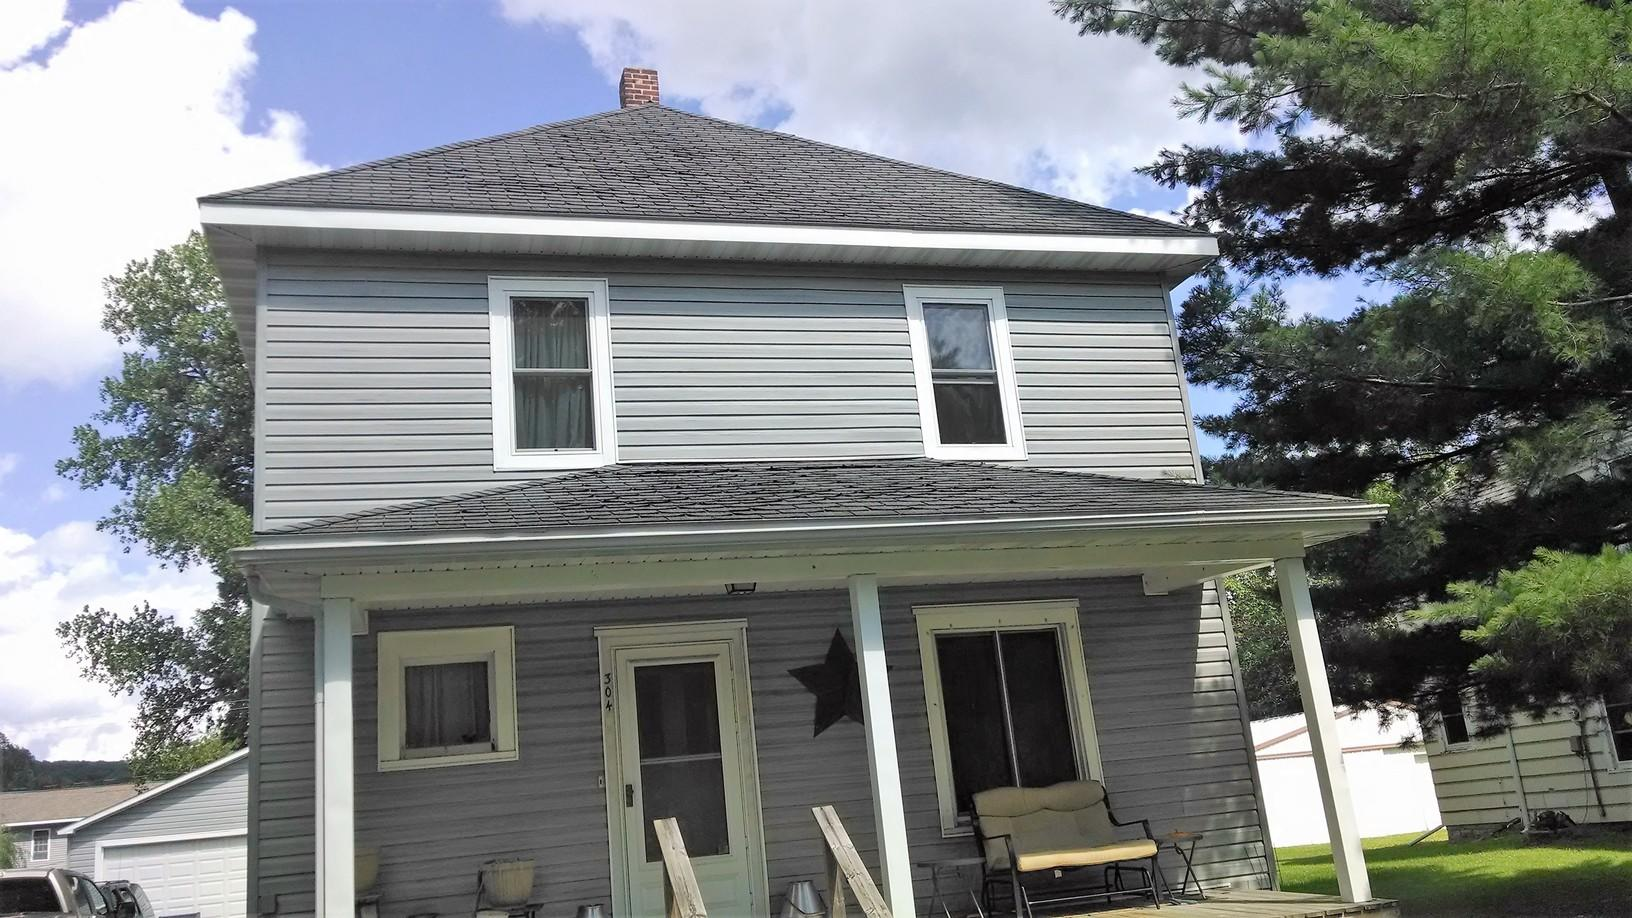 Rushford, MN Hail Damage Repair - Before Photo